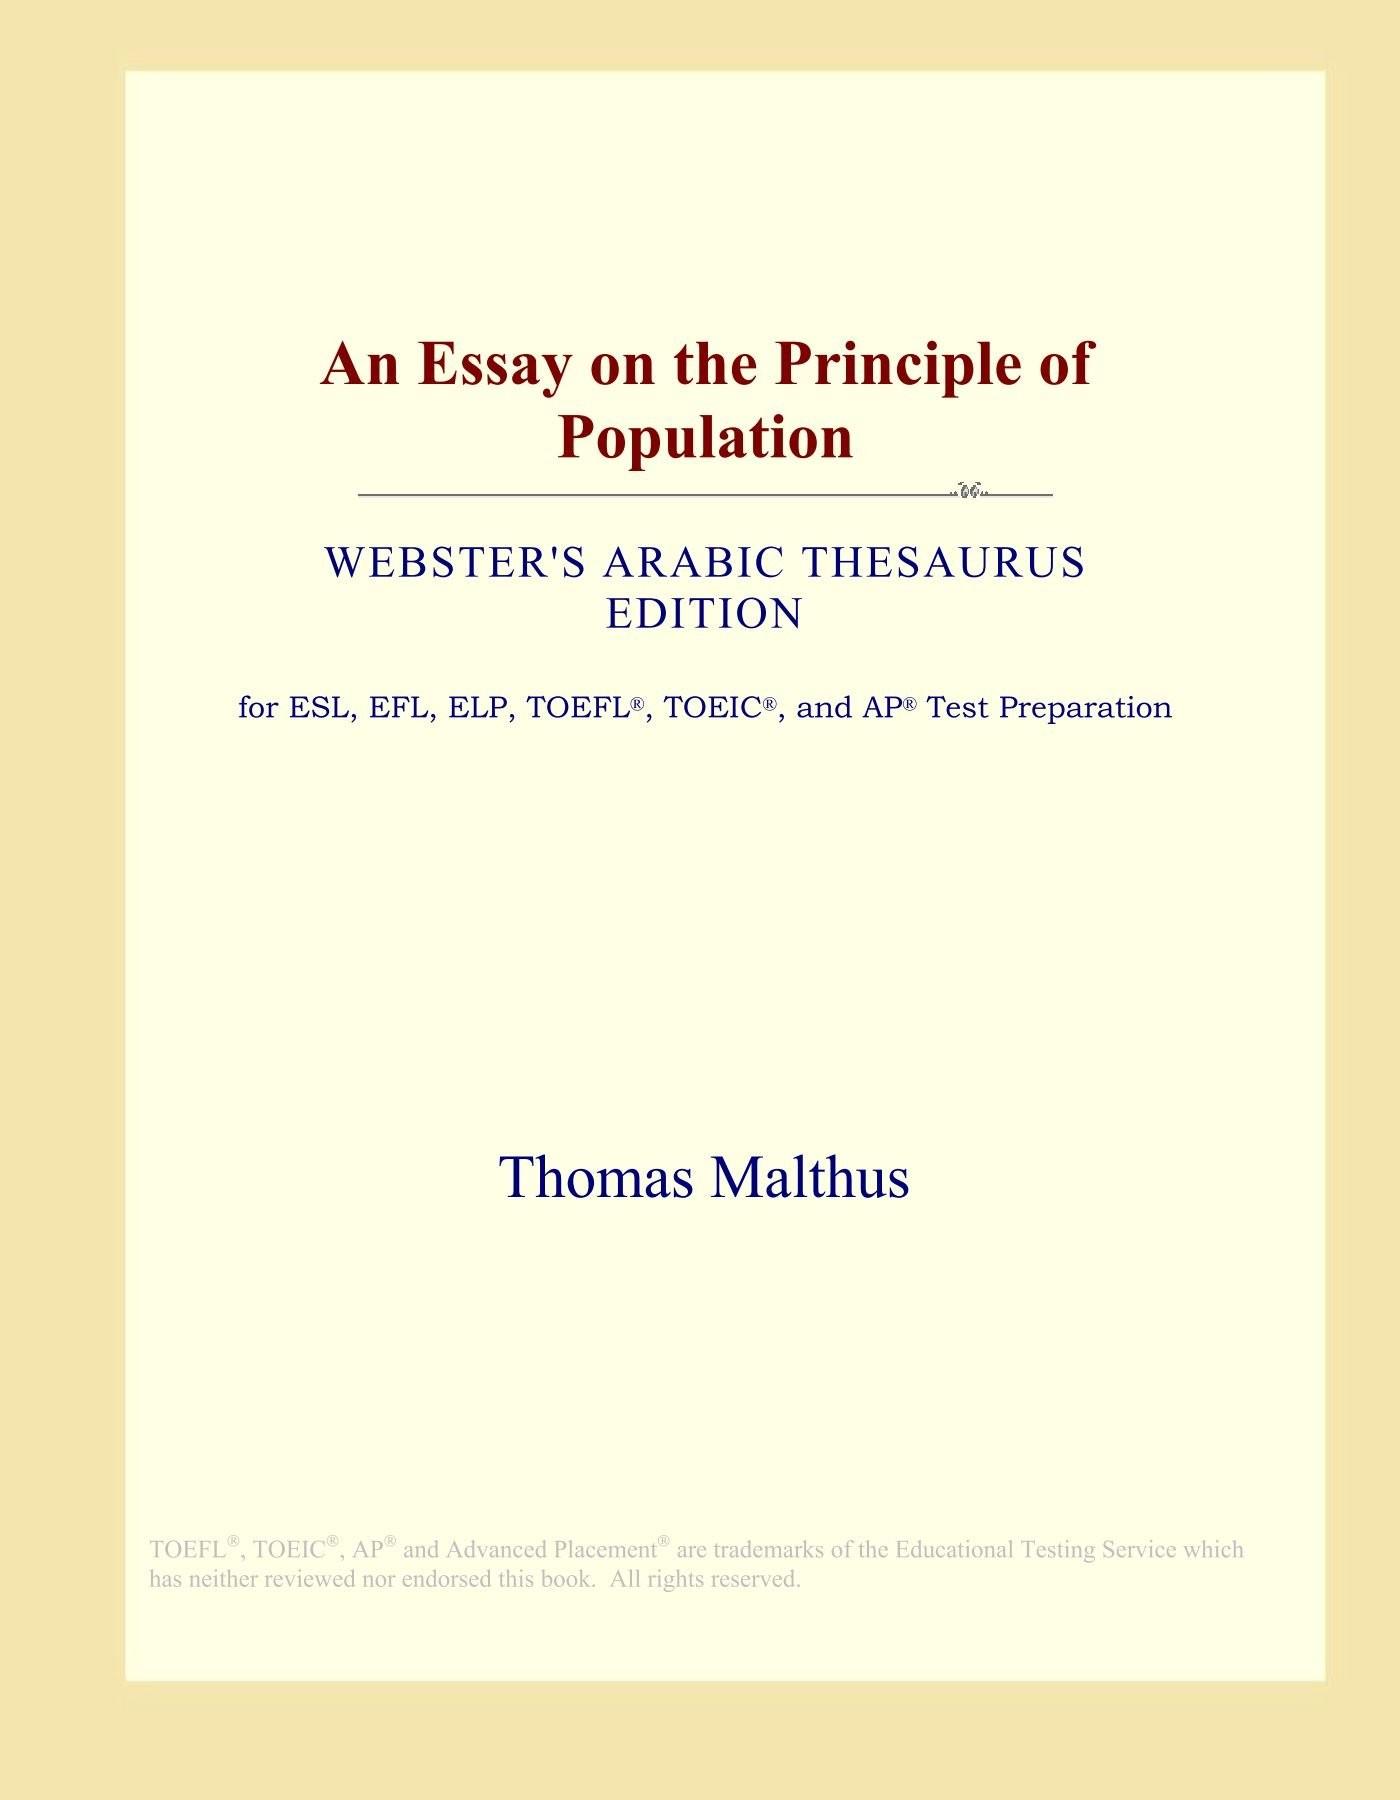 015 61groeunvgl Essay On The Principle Of Population Singular Malthus Sparknotes Thomas Main Idea 1400